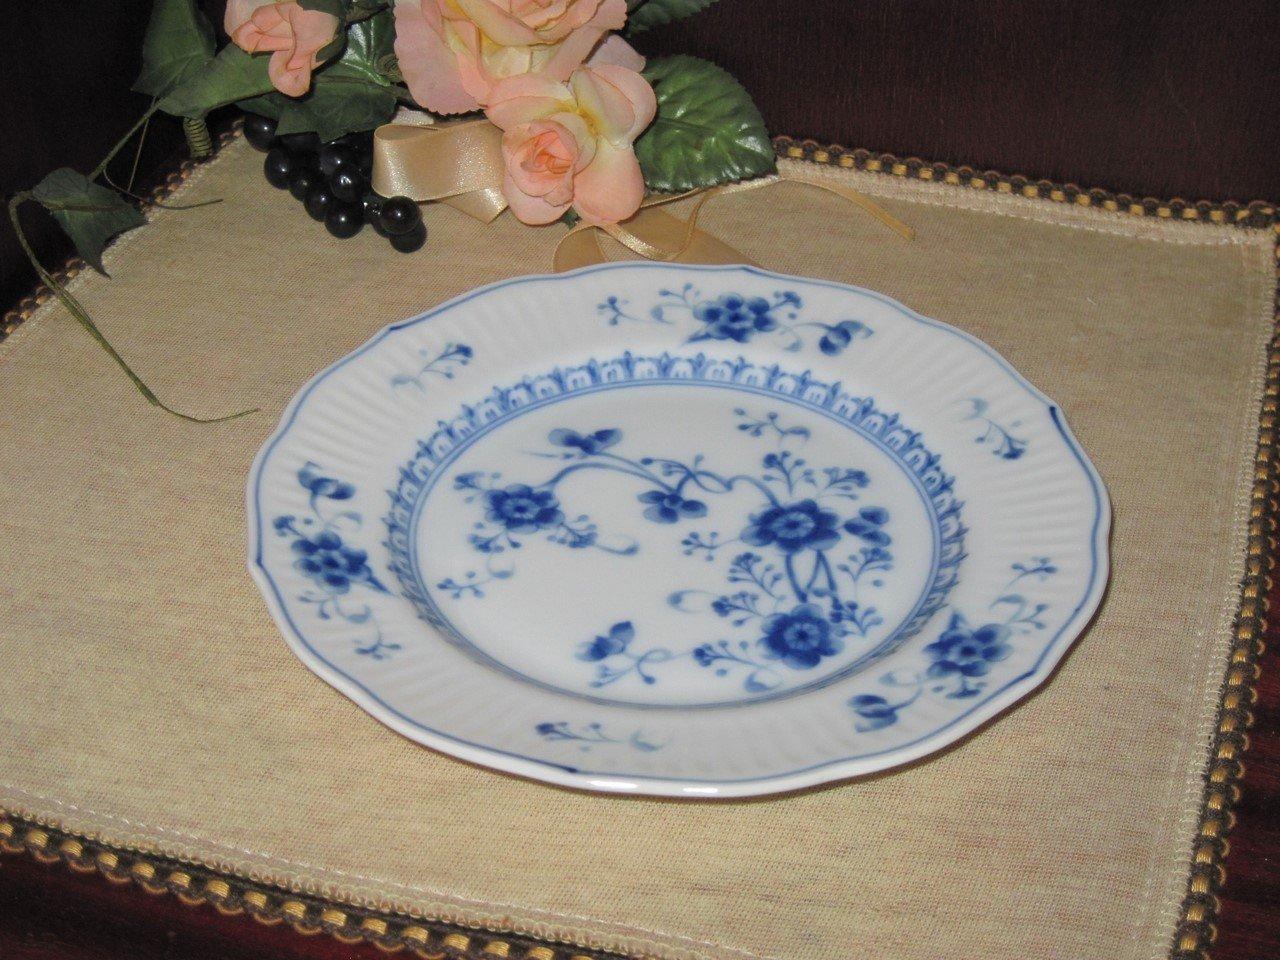 bread butter plate victoria blue no 7050 blaue blumen einmalig. Black Bedroom Furniture Sets. Home Design Ideas